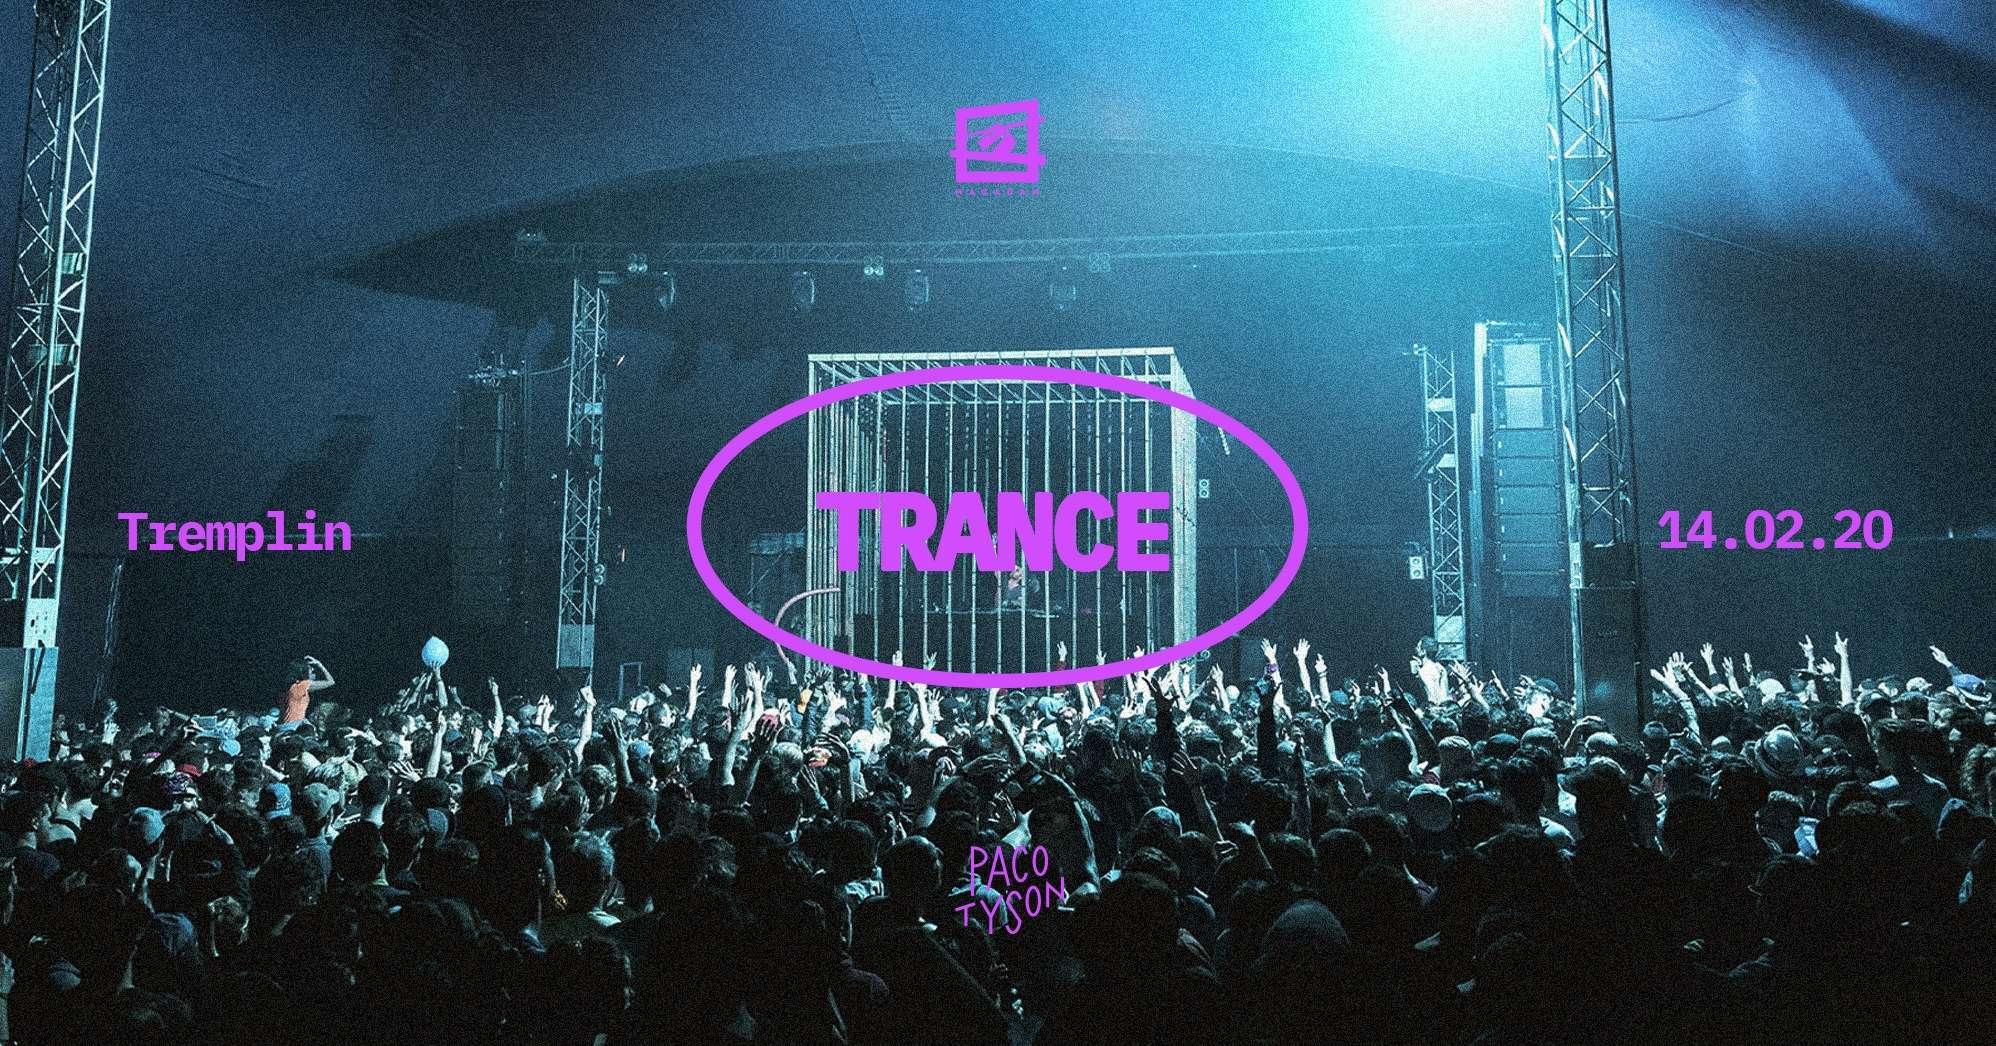 paco tremplin trance 2020